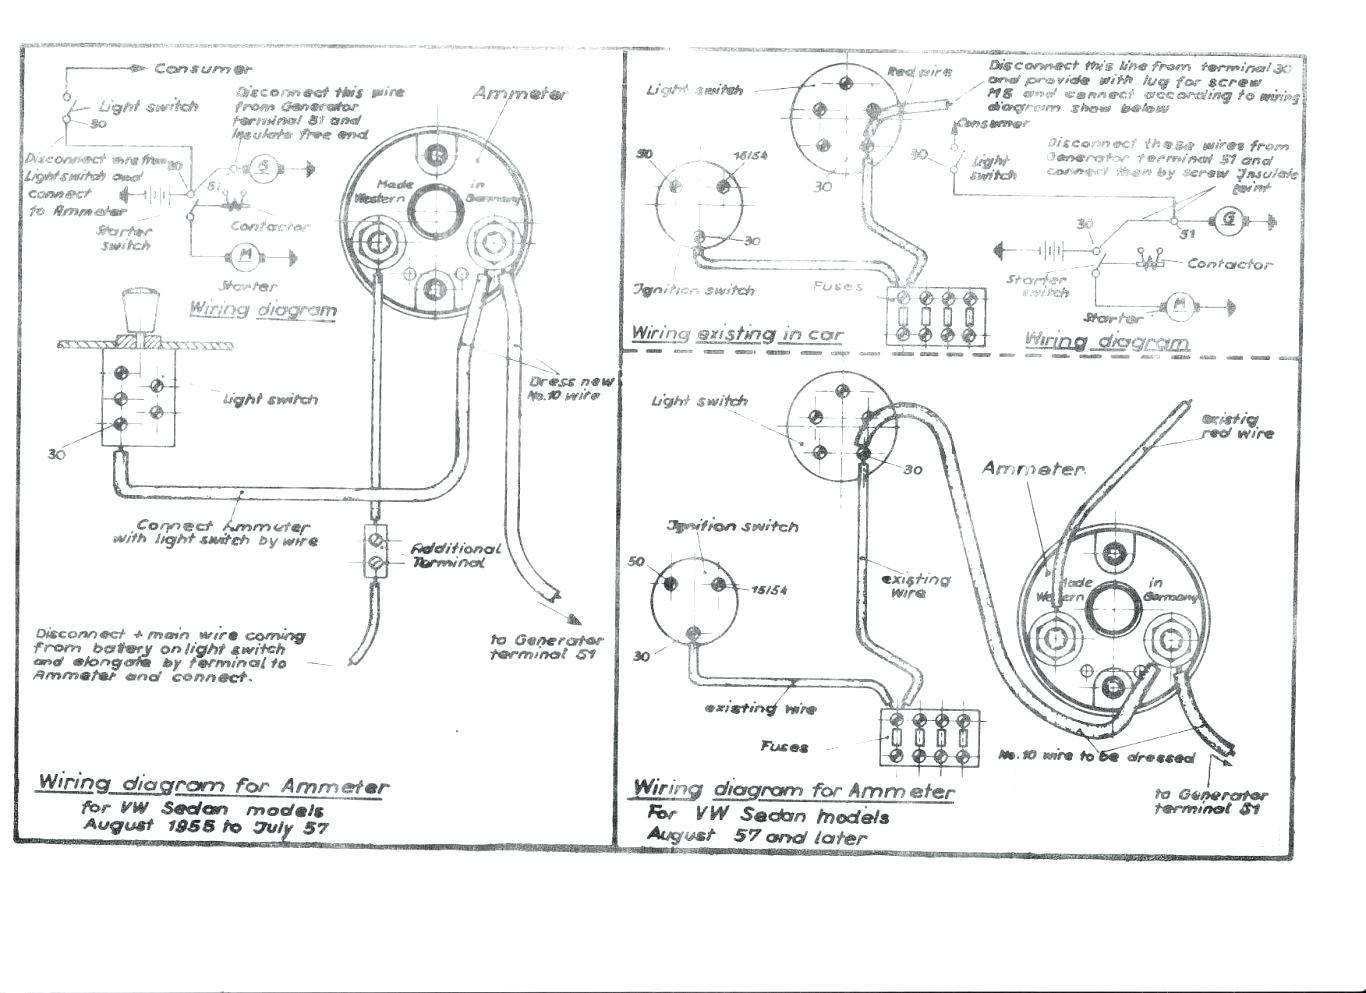 Autometer Tach Wiring Diagram C2 Auto Gauge Oil Pressure Other Items - Autometer Tach Wiring Diagram